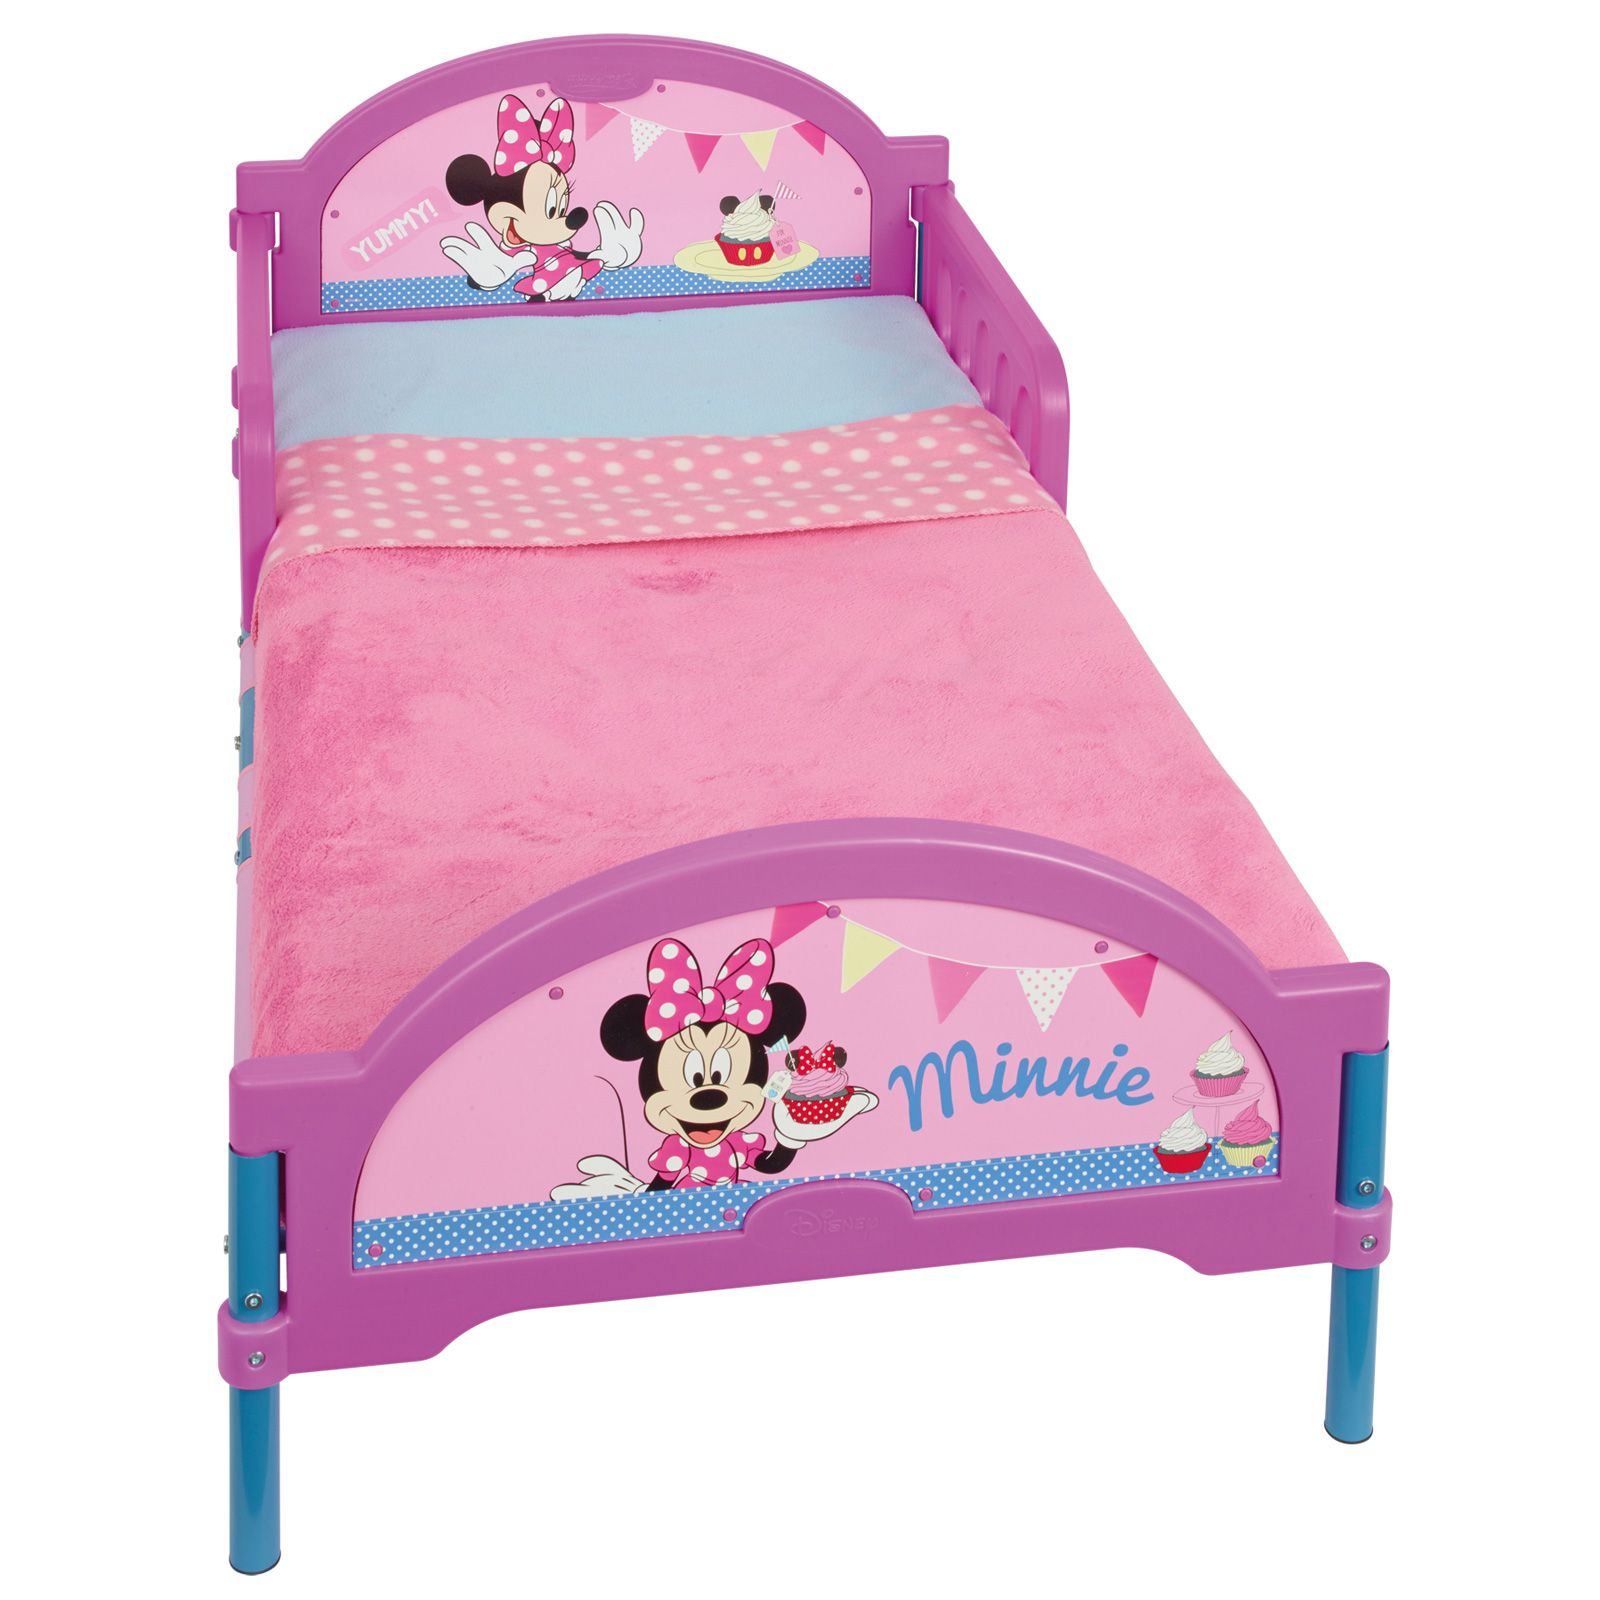 KIDS CHARACTER COSYTIME TODDLER JUNIOR BEDS - MATTRESS ...